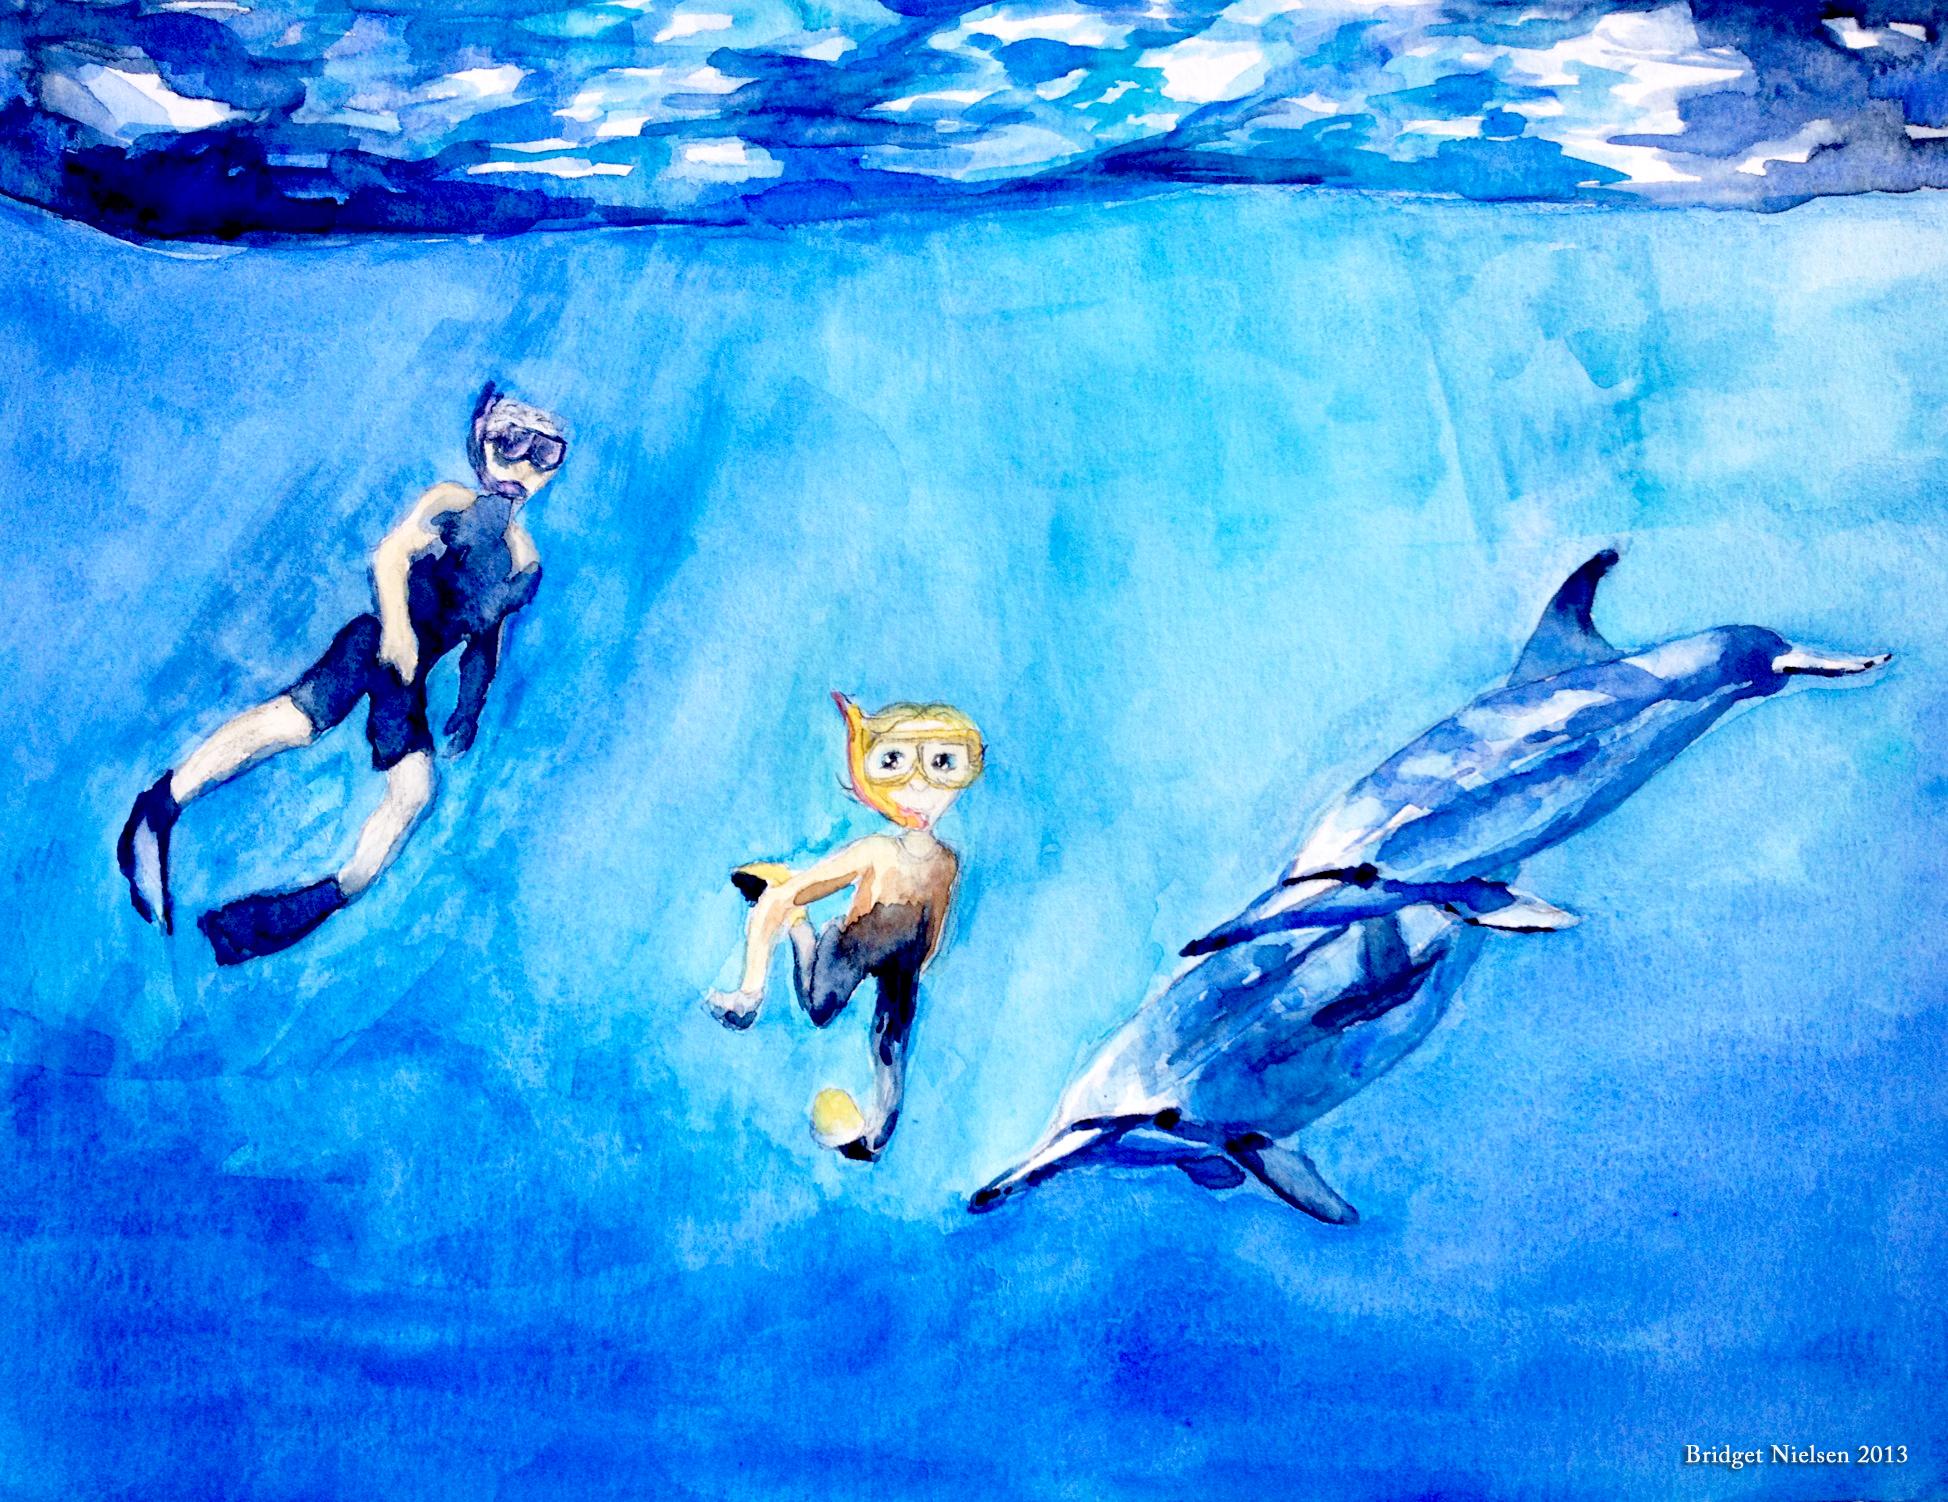 Phin, The Cetacean Hybrid Ambassador